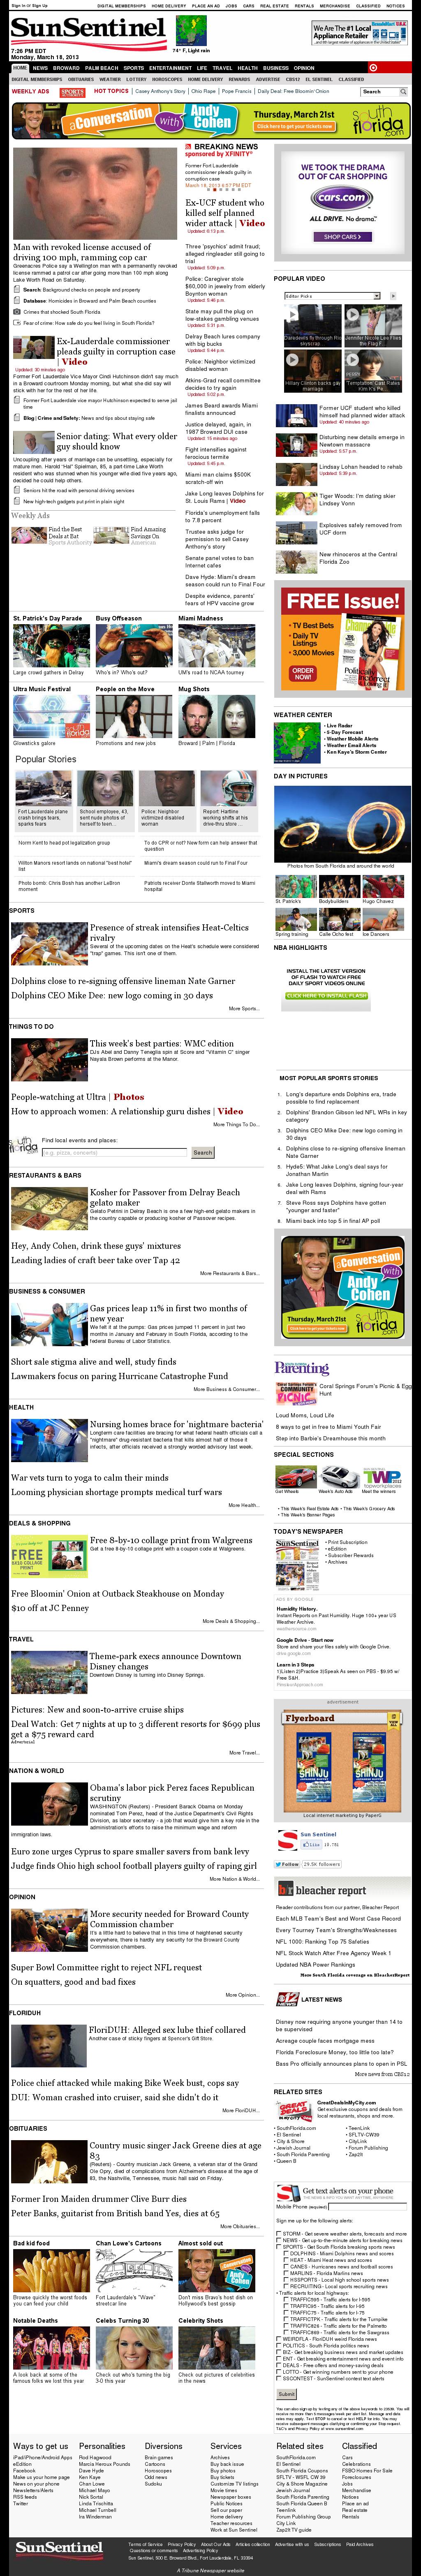 (Florida) Sun Sentinel at Monday March 18, 2013, 11:27 p.m. UTC